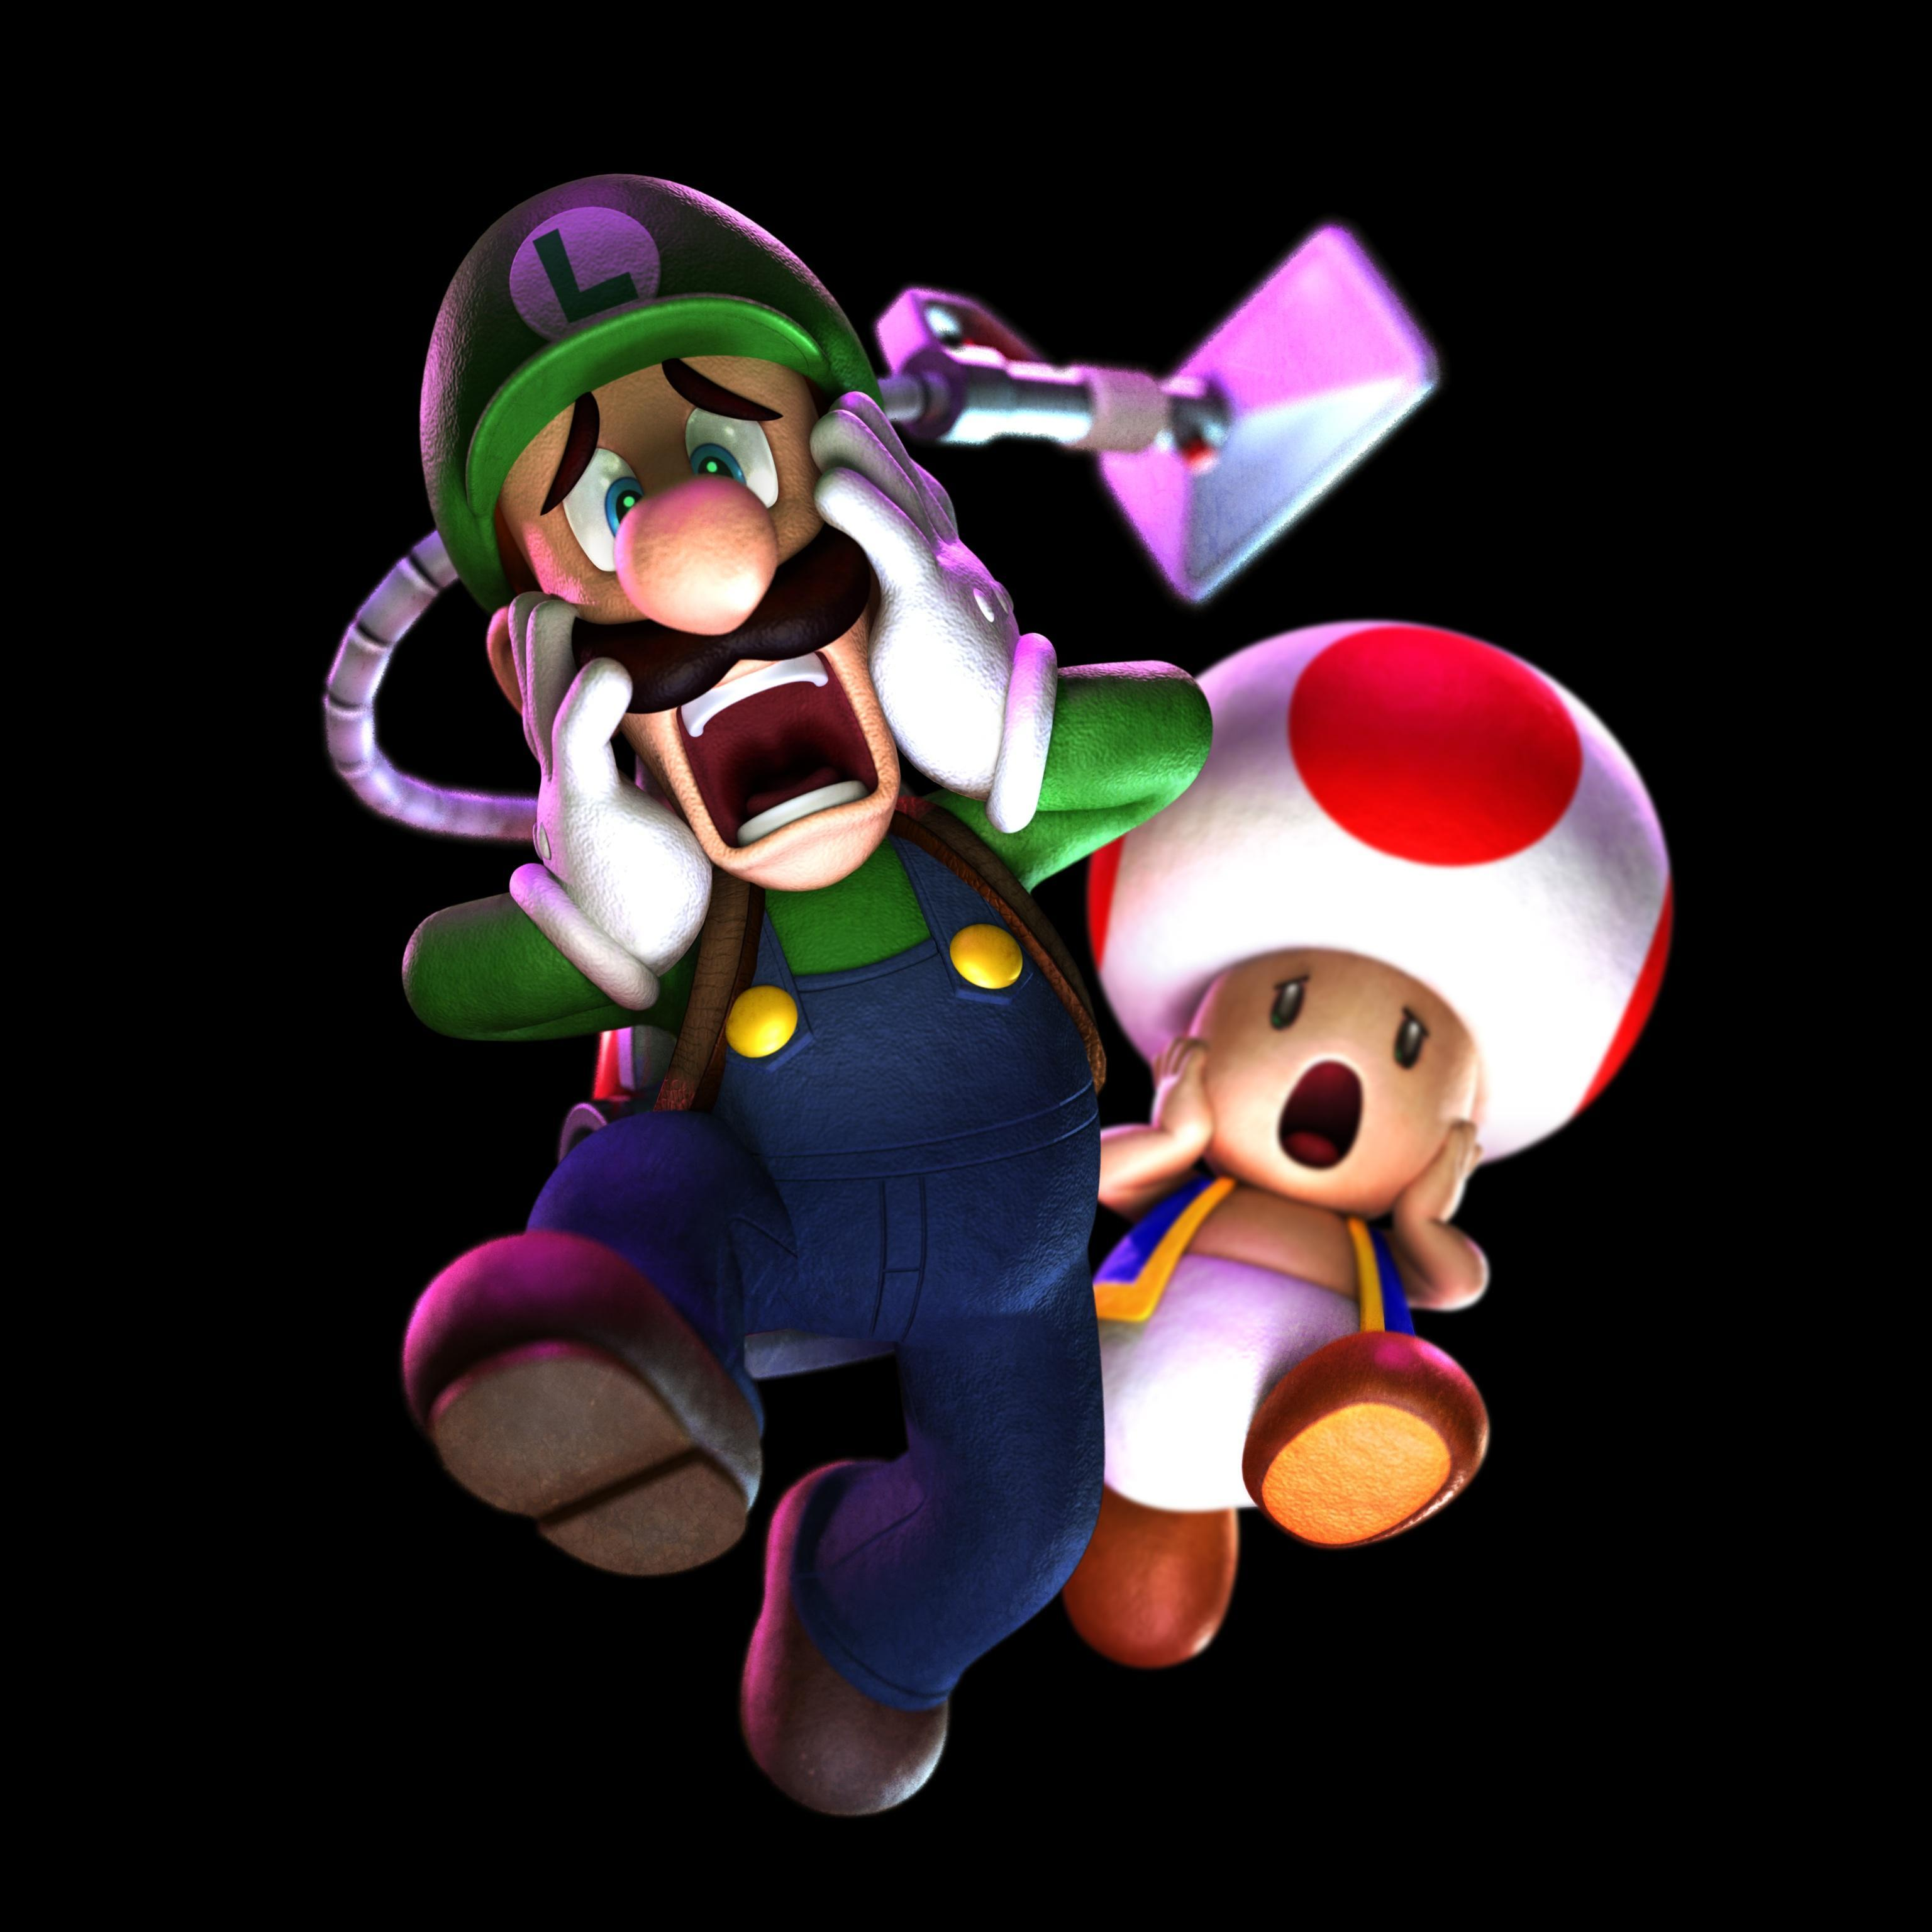 Luigi's Mansion 2: Dark Moon (Nintendo 3DS) Character, Ghost